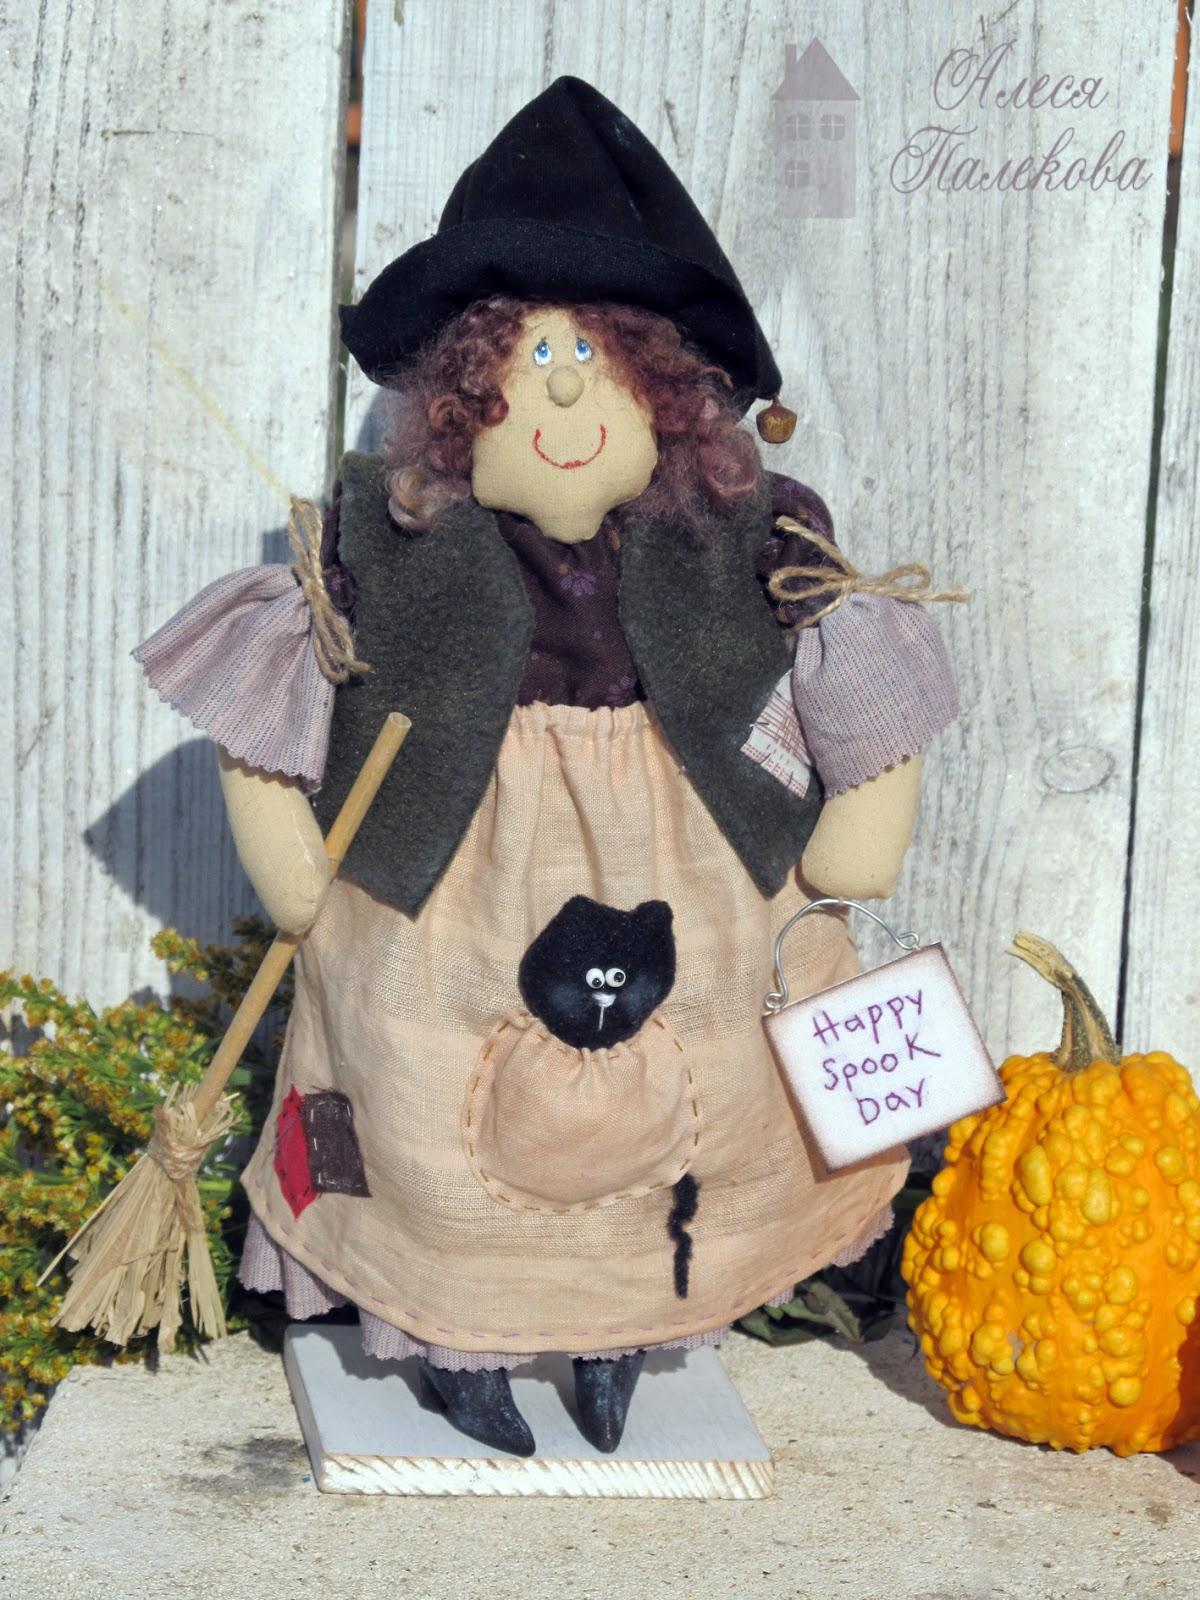 кукла, ведьмочка, хэллоуин, happy spook day, тыквы, выкройка, Halloween